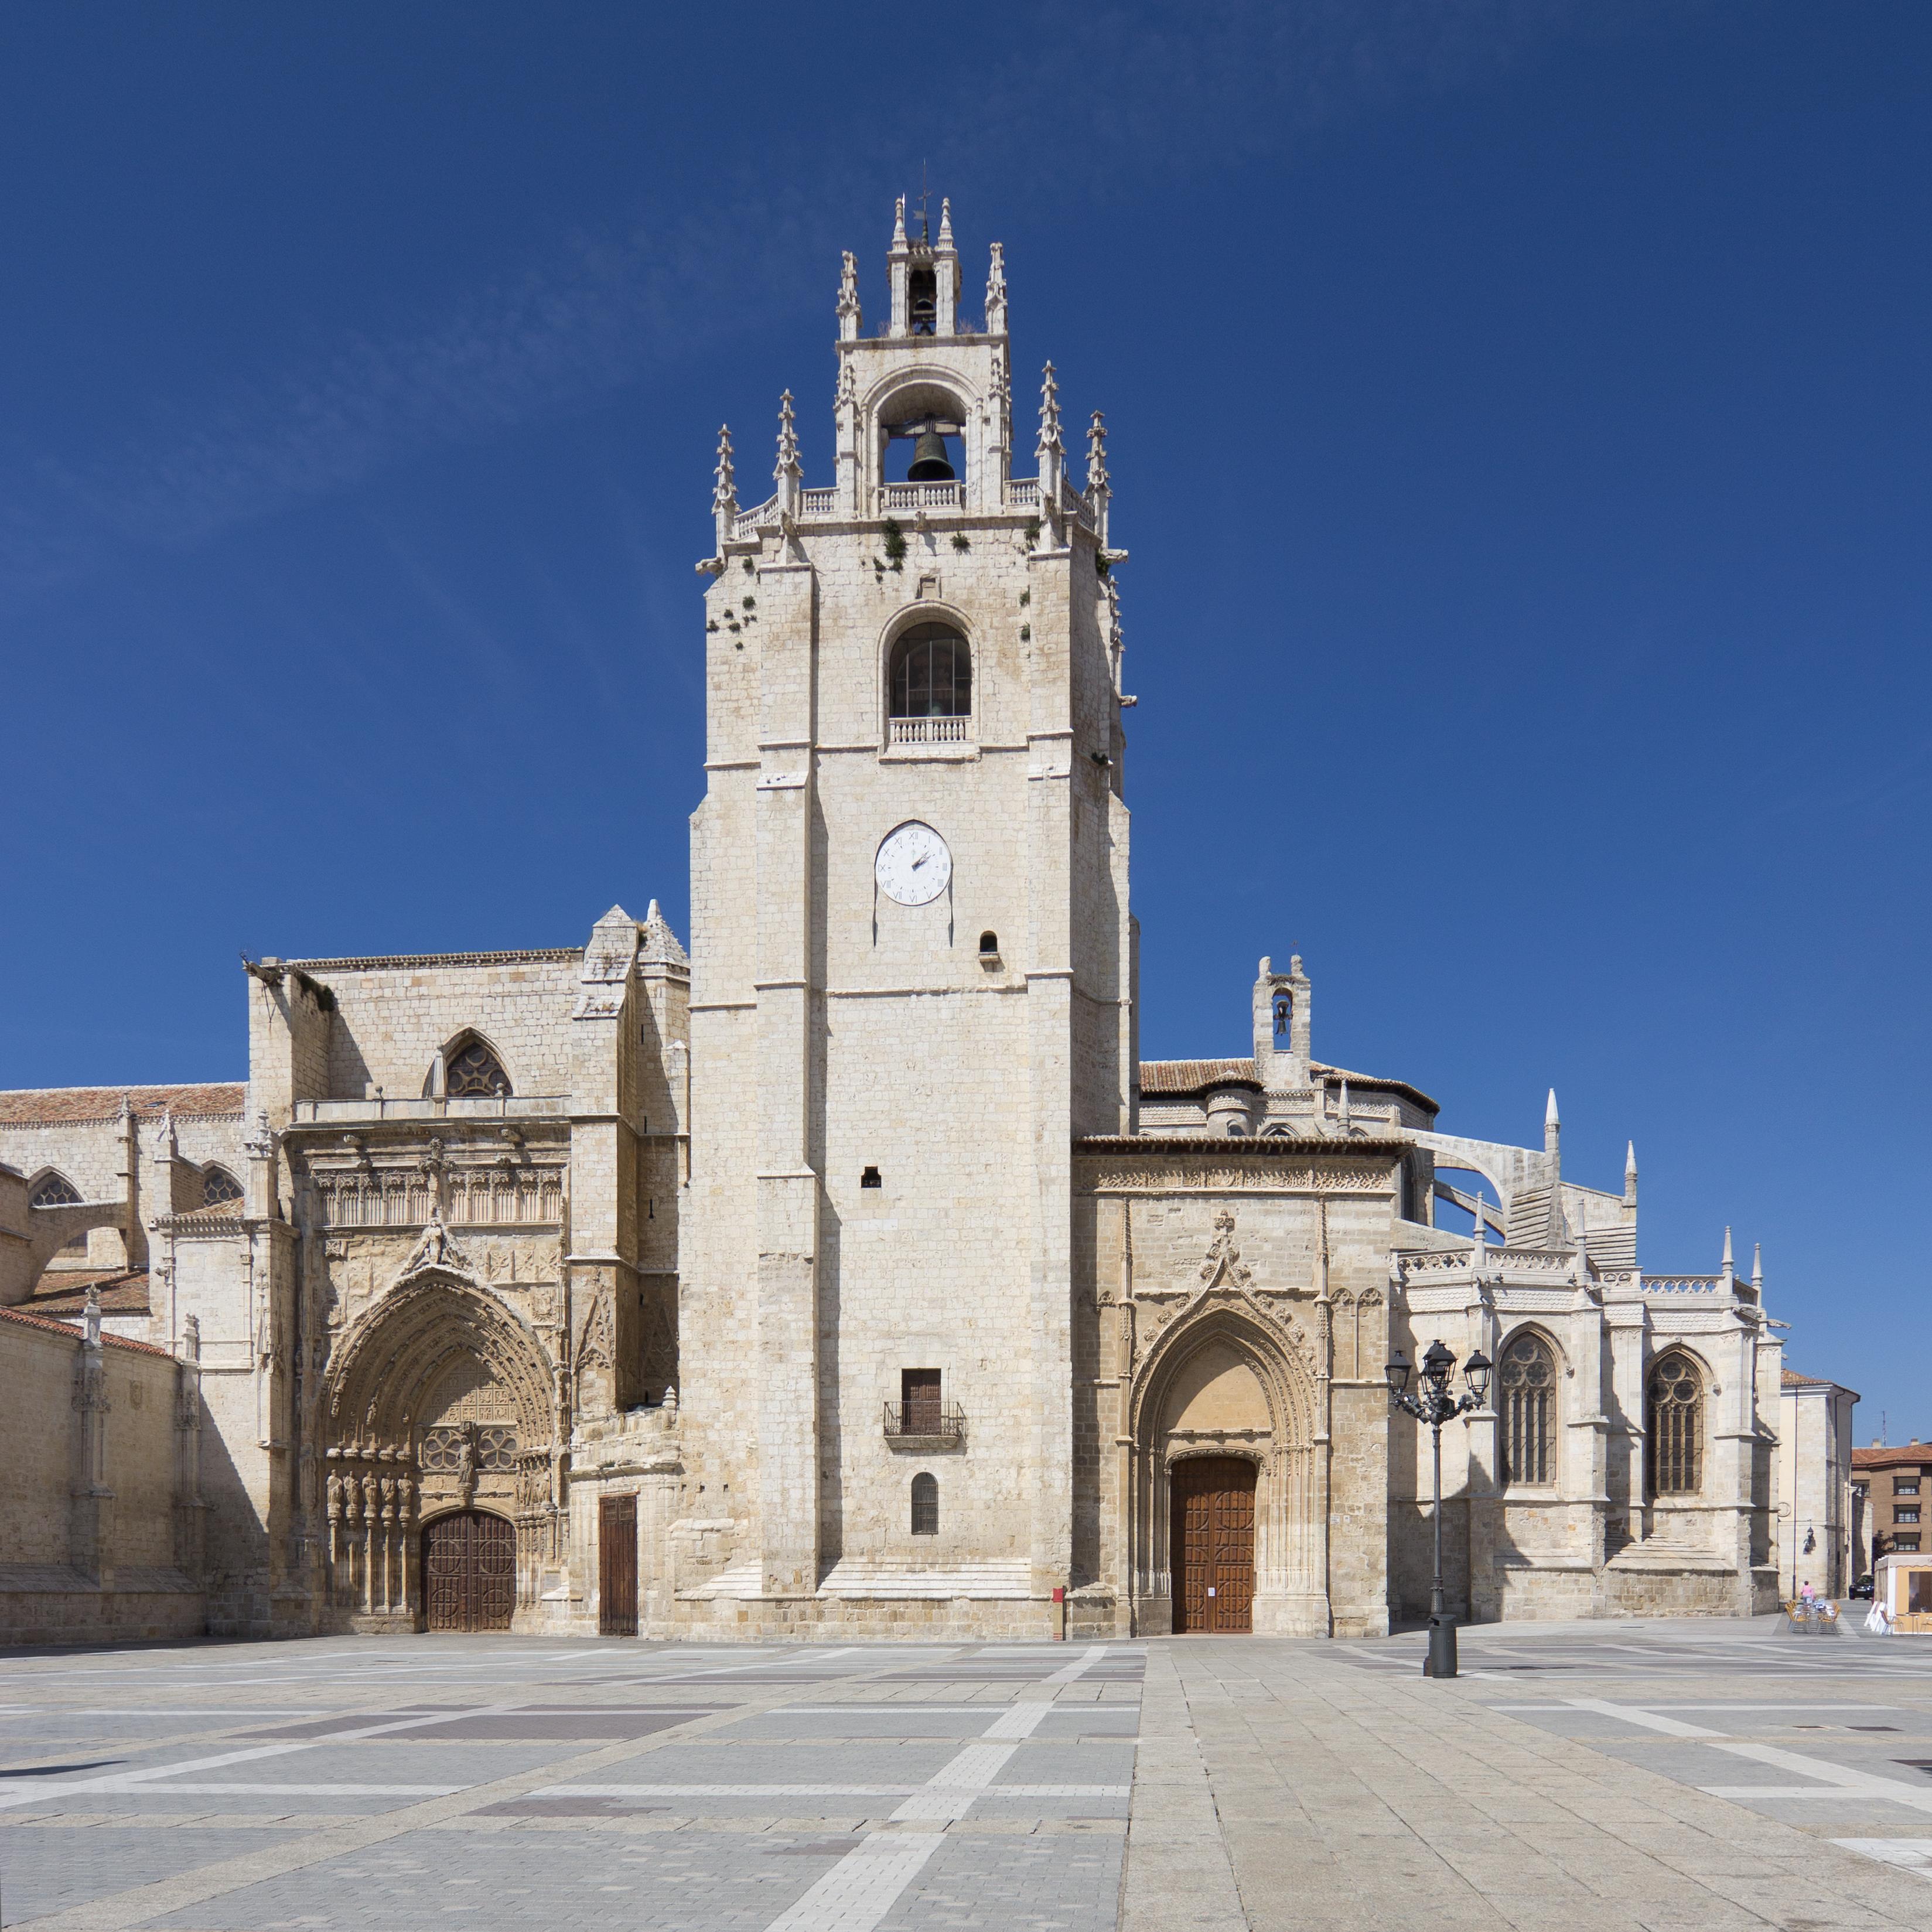 File:Catedral de San Antolín de Palencia - 01.jpg - Wikipedia